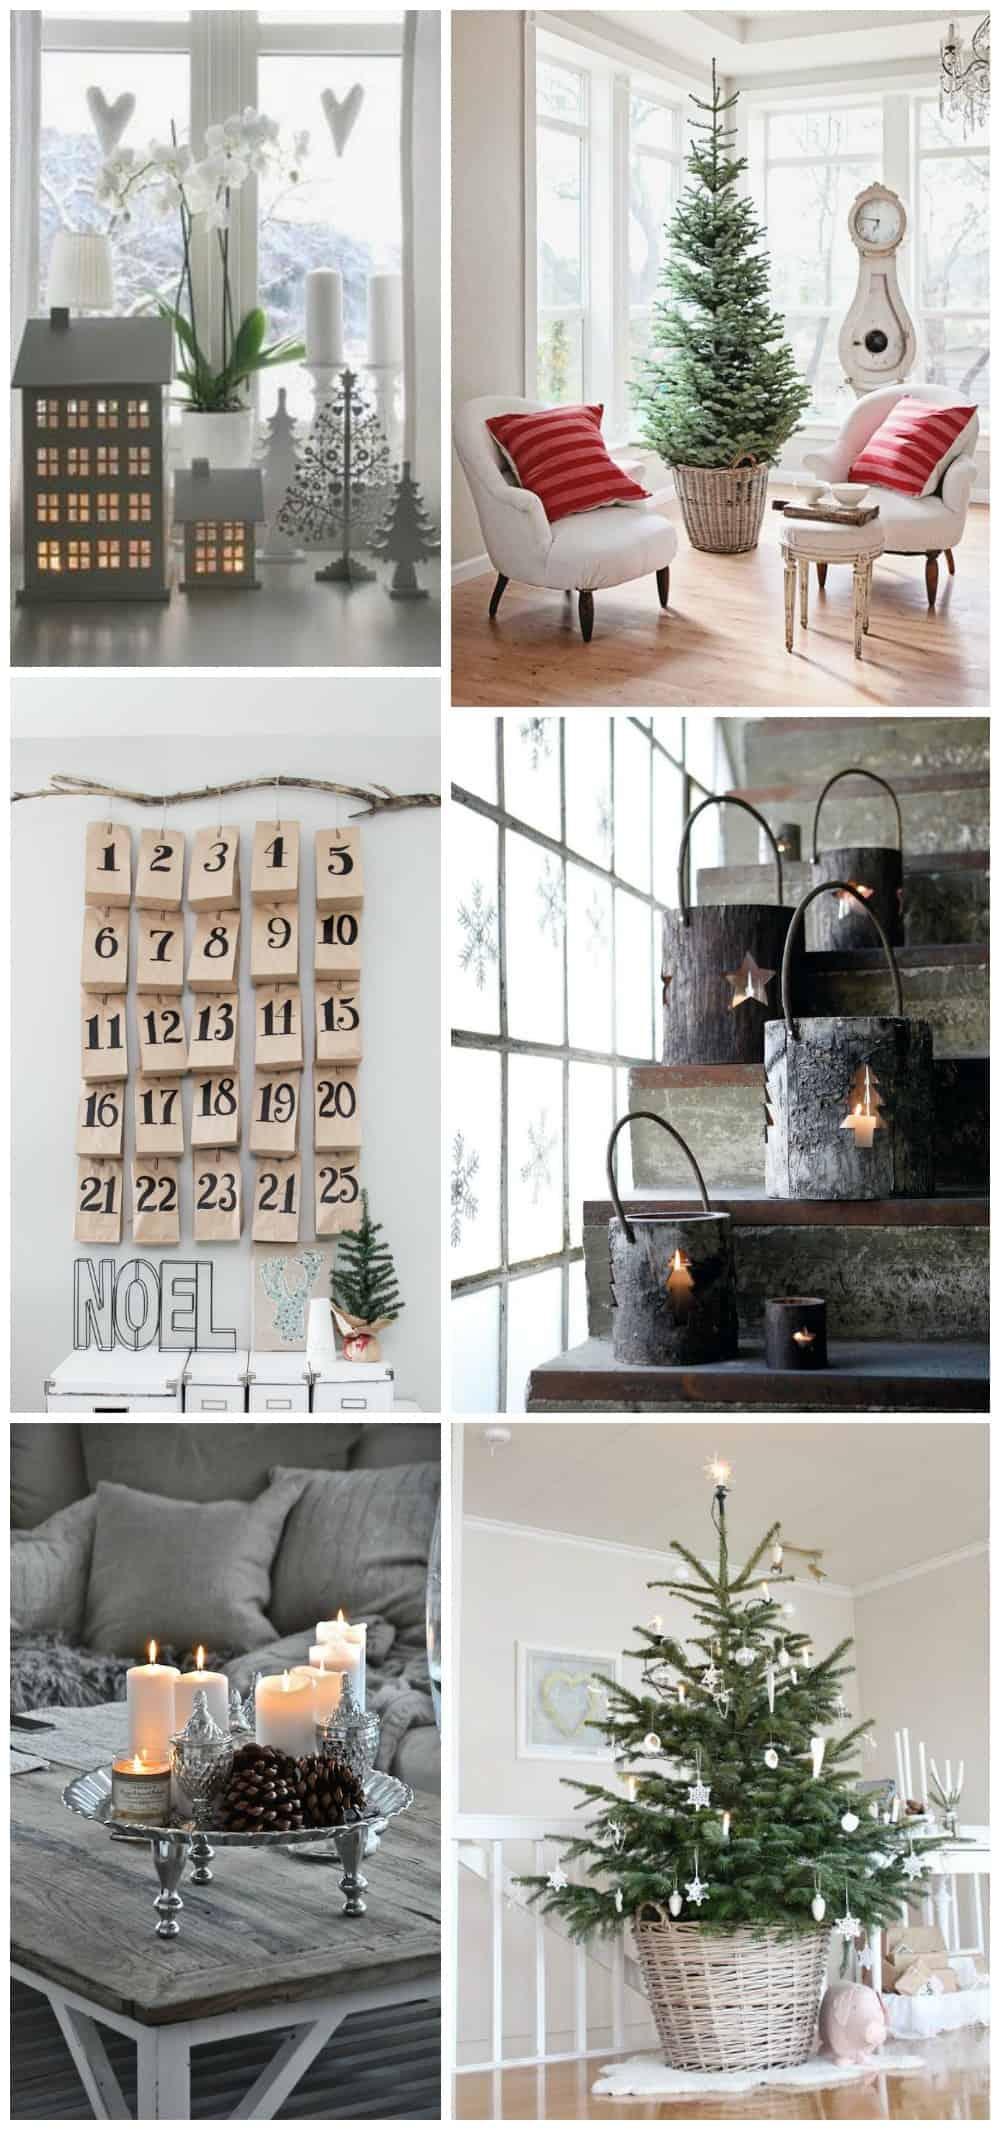 Soggiorni stile shabby chic : mobili soggiorno stile shabby chic ...